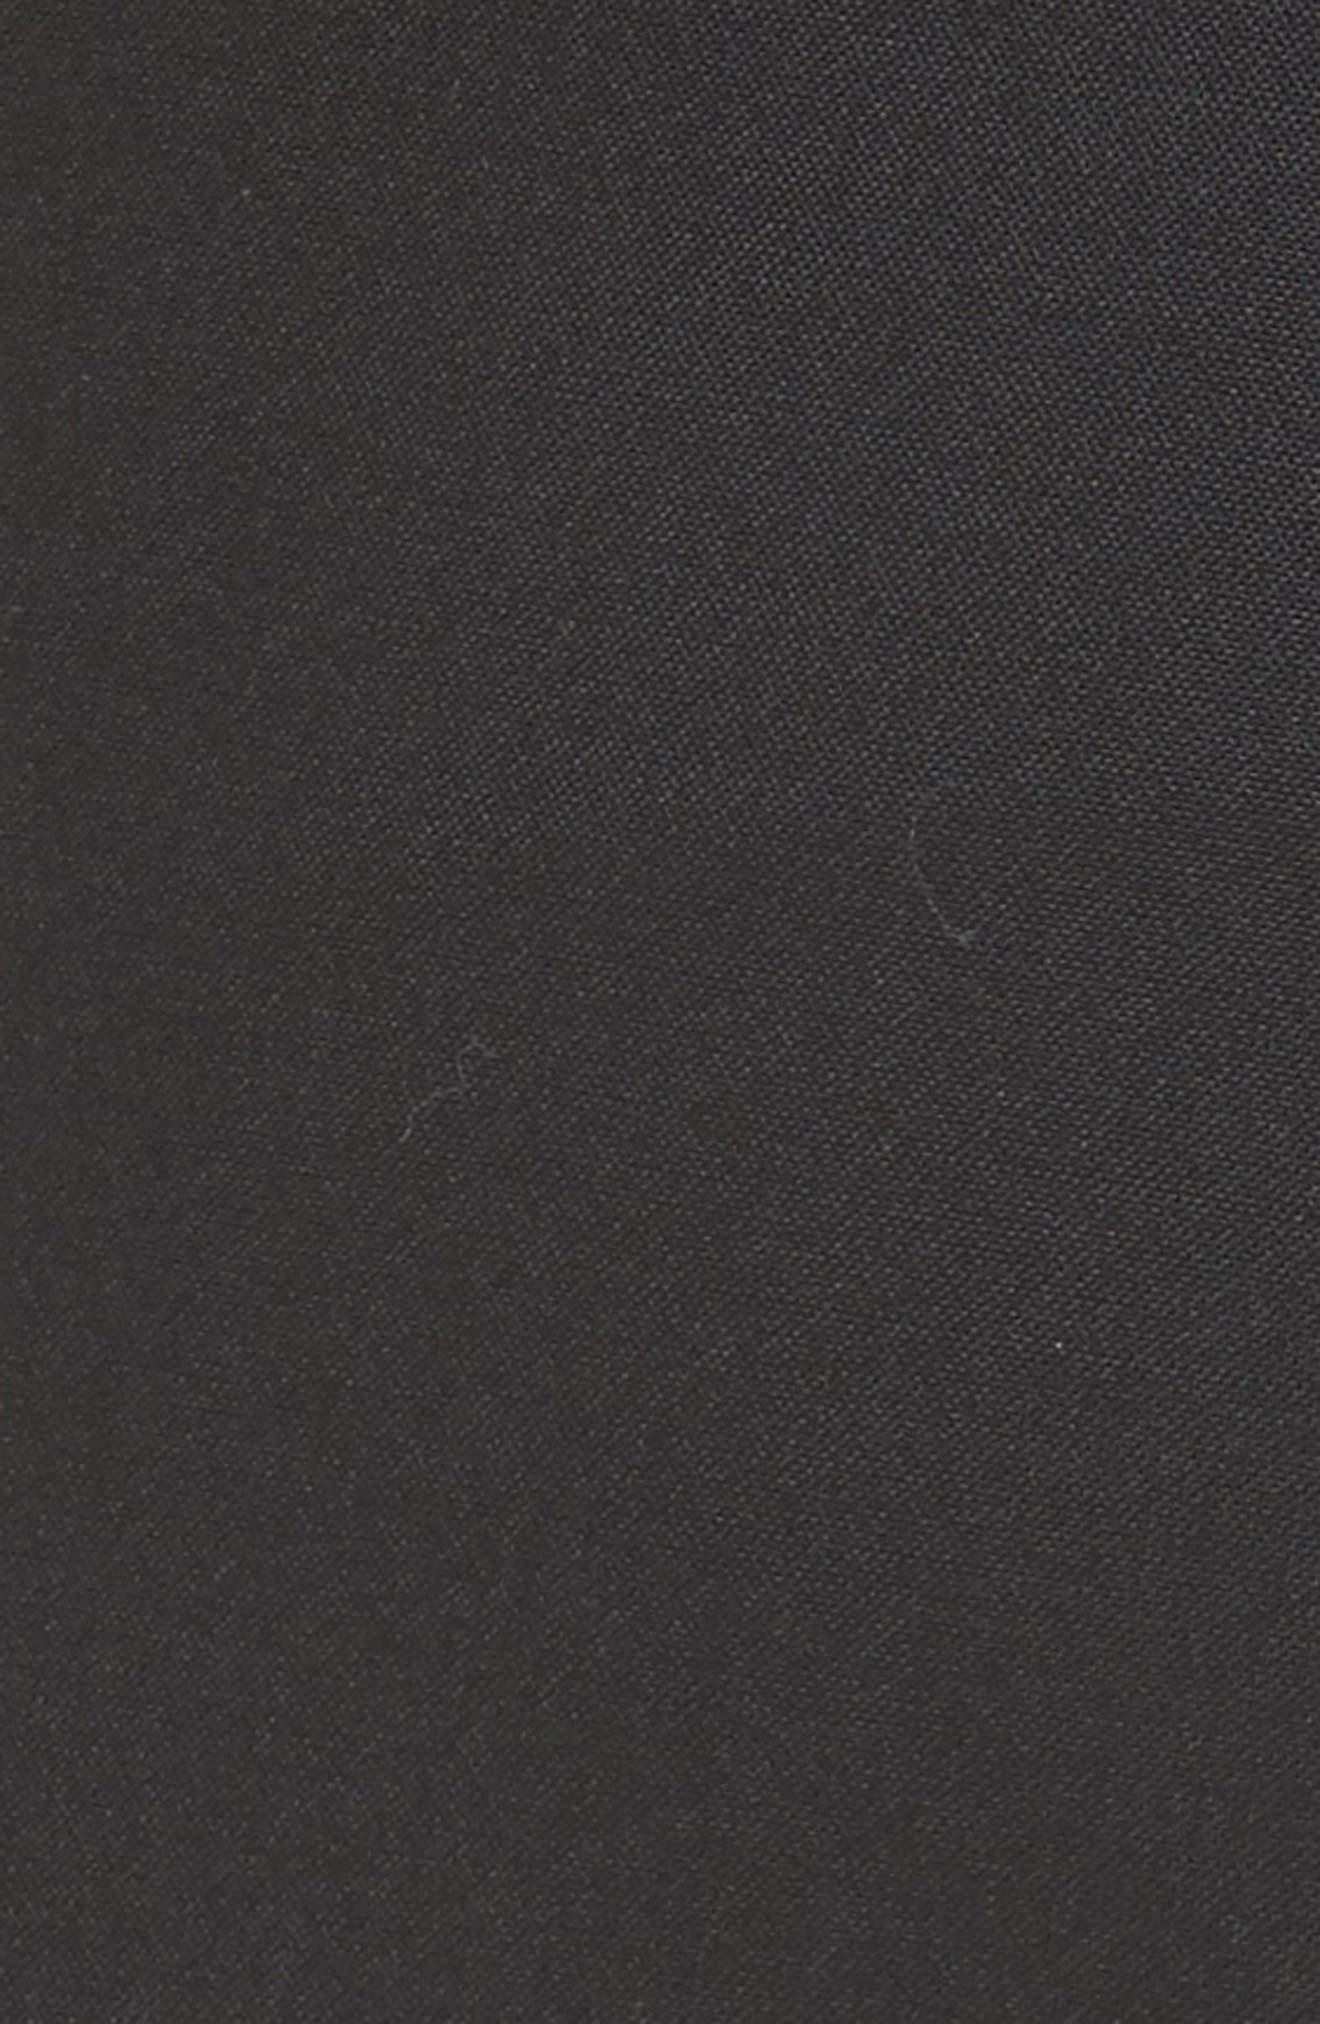 Hartsdale B Good Wool Suit Pants,                             Alternate thumbnail 5, color,                             BLACK